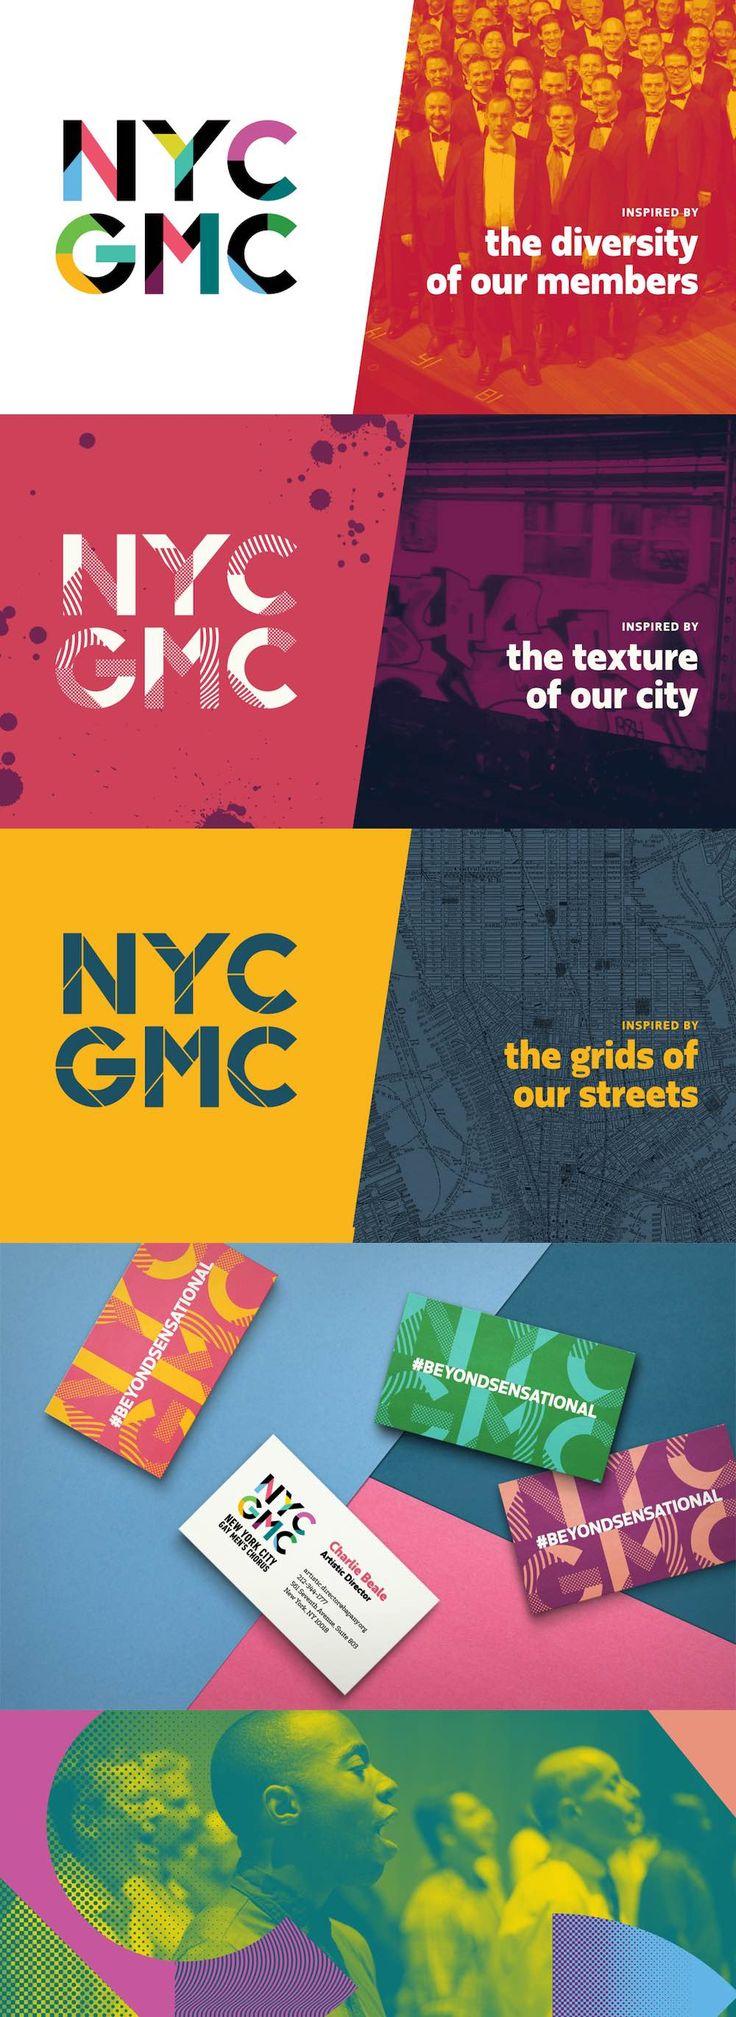 NYC GMC                                                                                                                                                      More